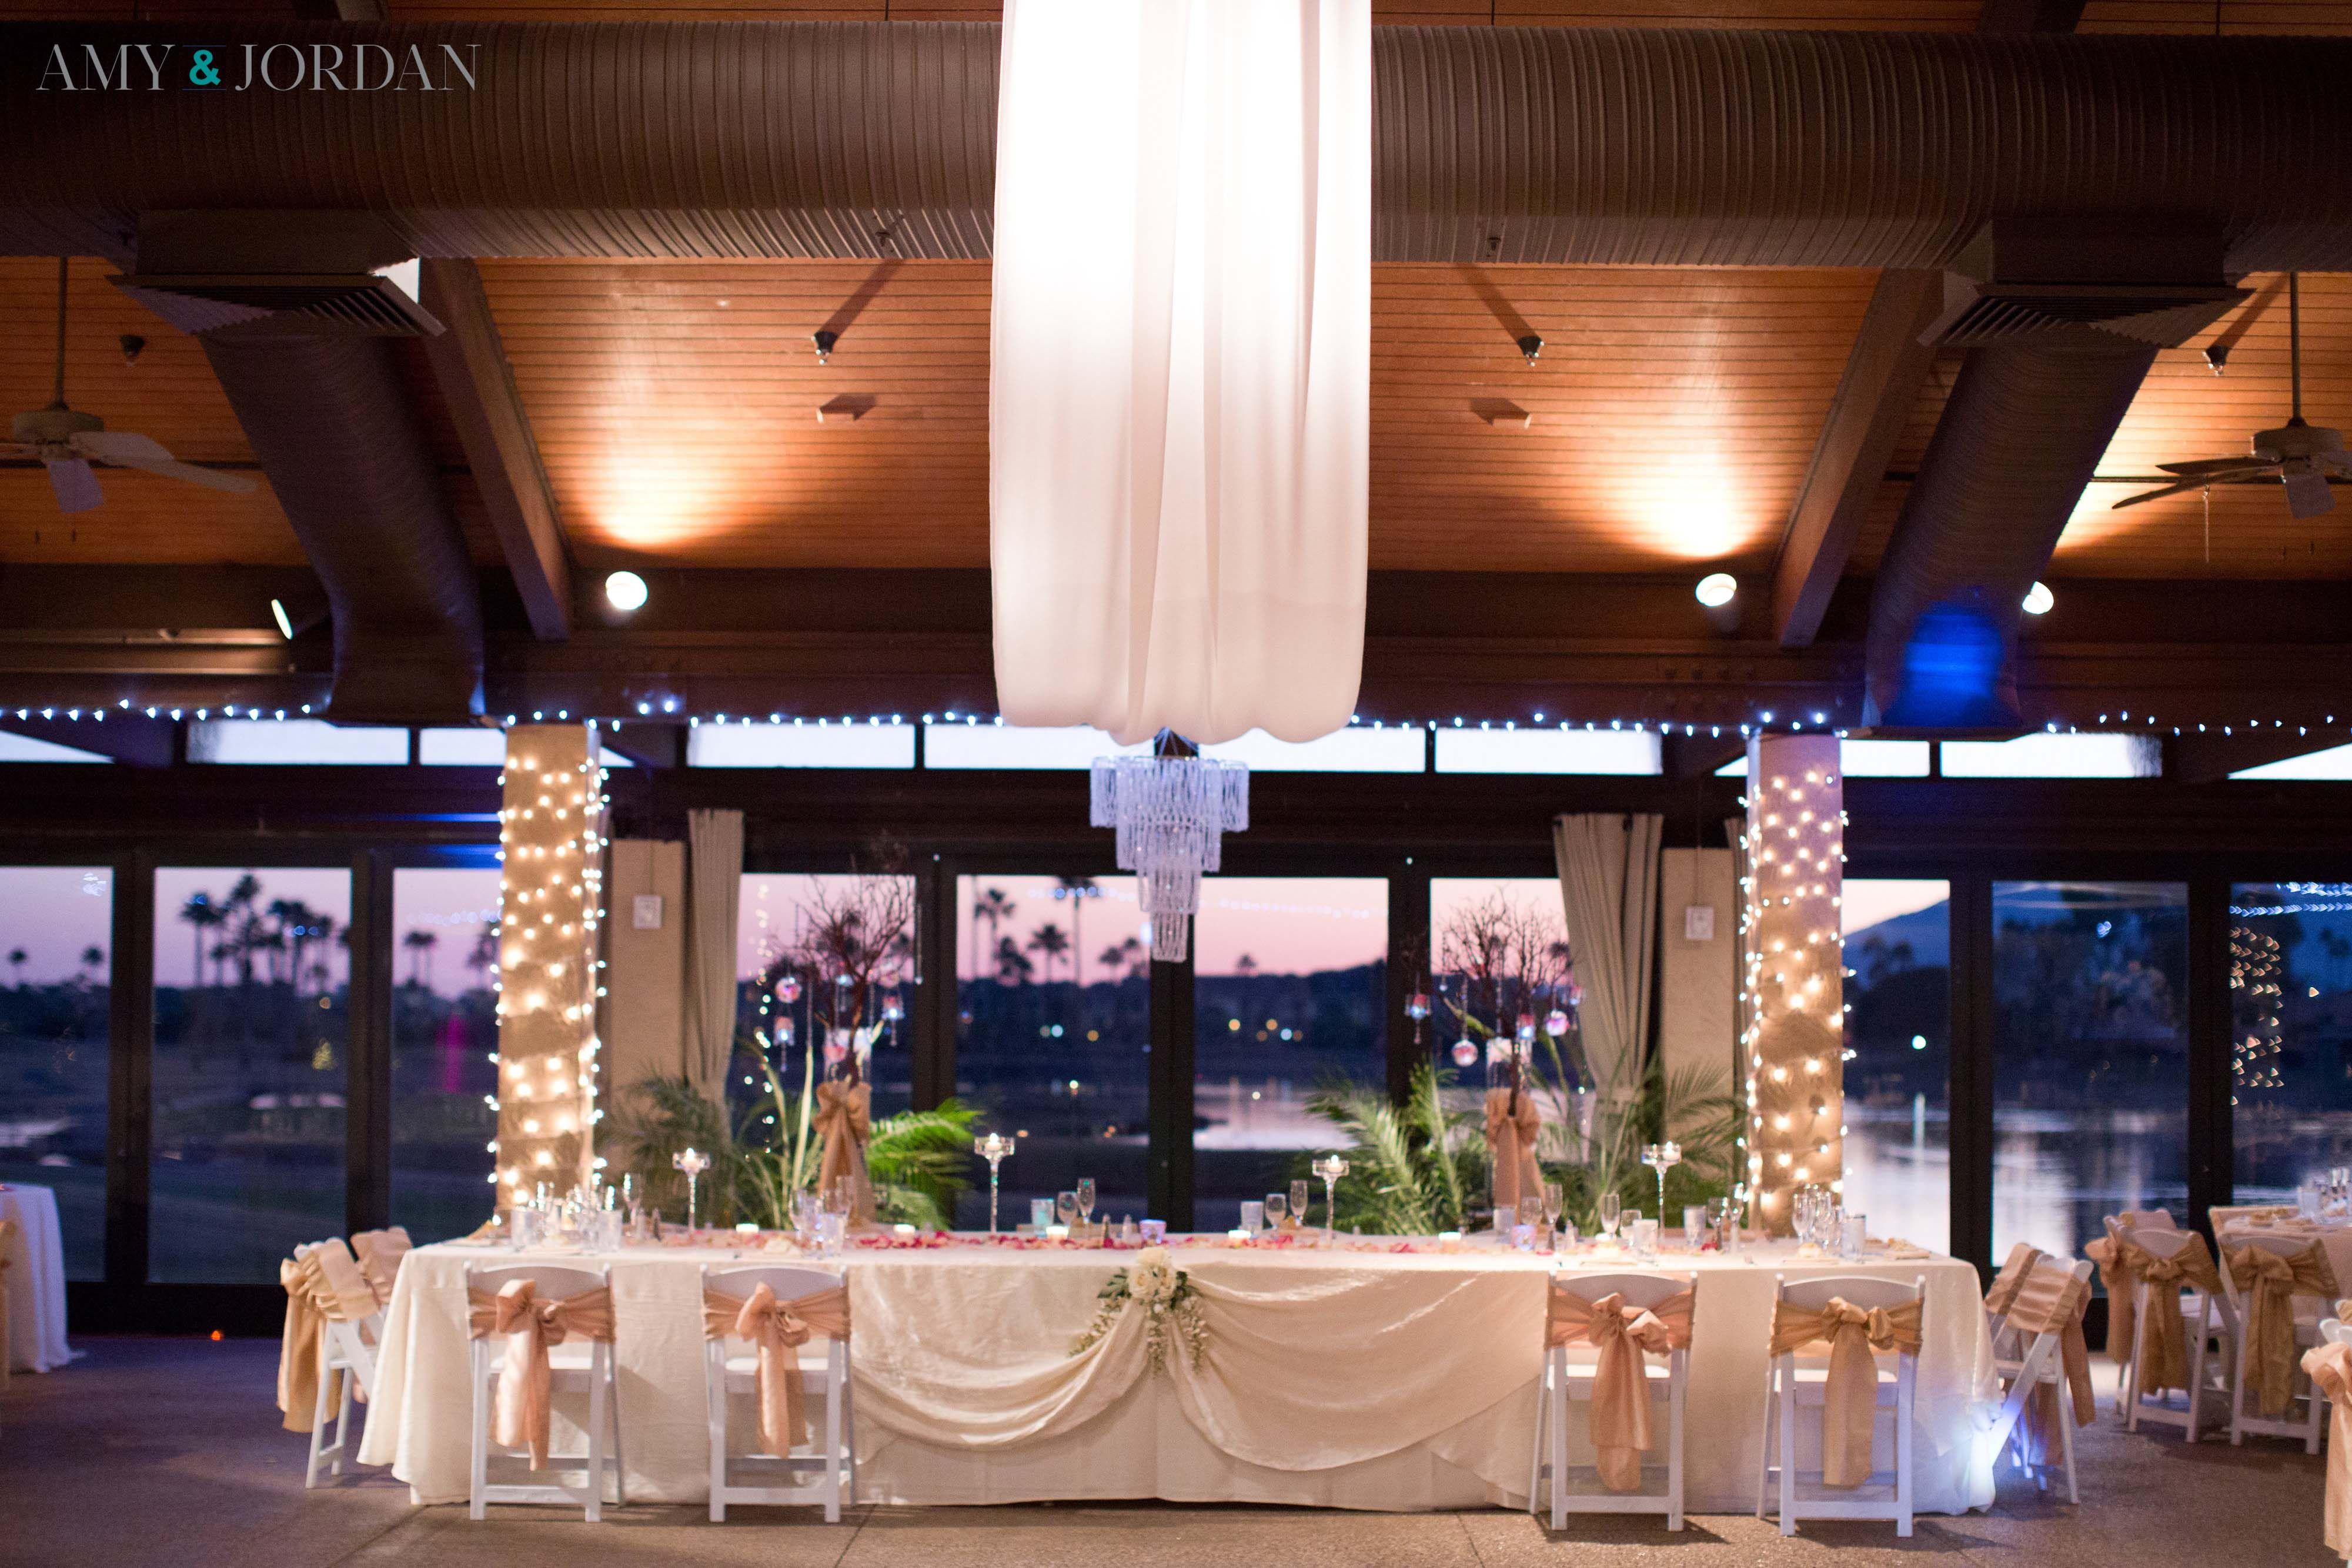 Wedding Reception Venue Mccormick Ranch Golf Club Scottsdale Photographer Amy Jordan Florist Karen Tyler